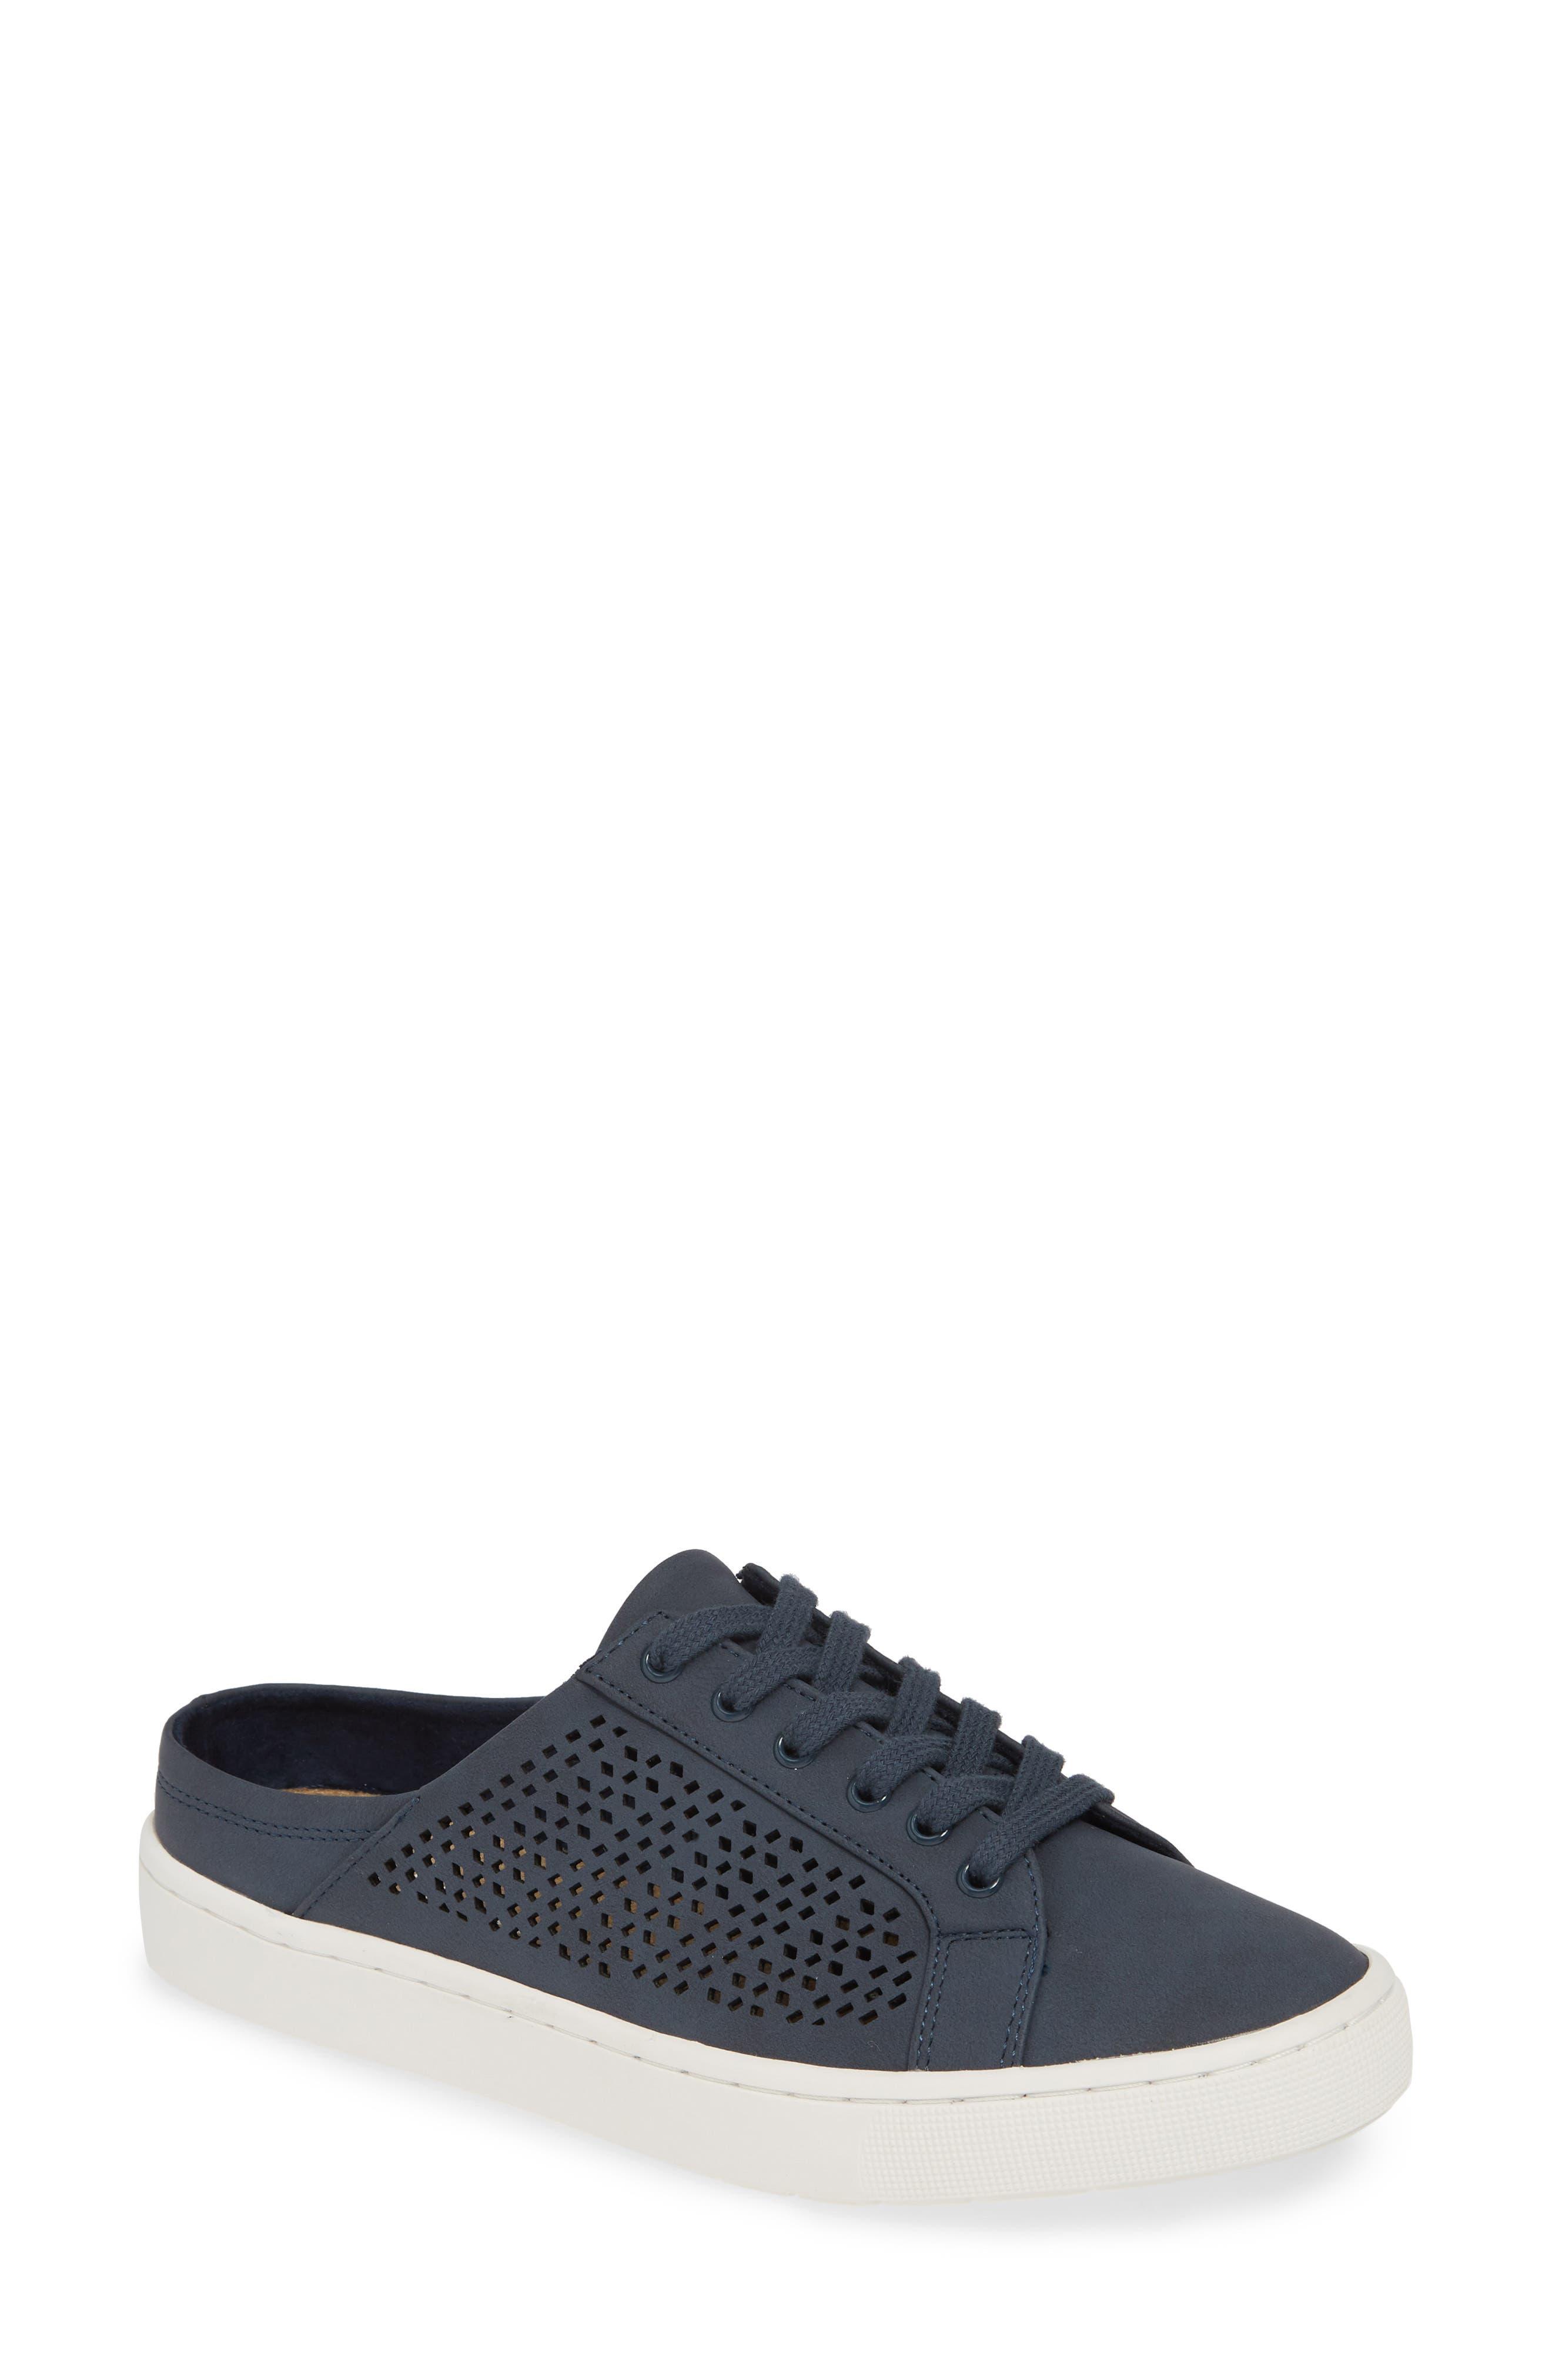 BELLA VITA Star Open Back Sneaker, Main, color, DENIM FABRIC